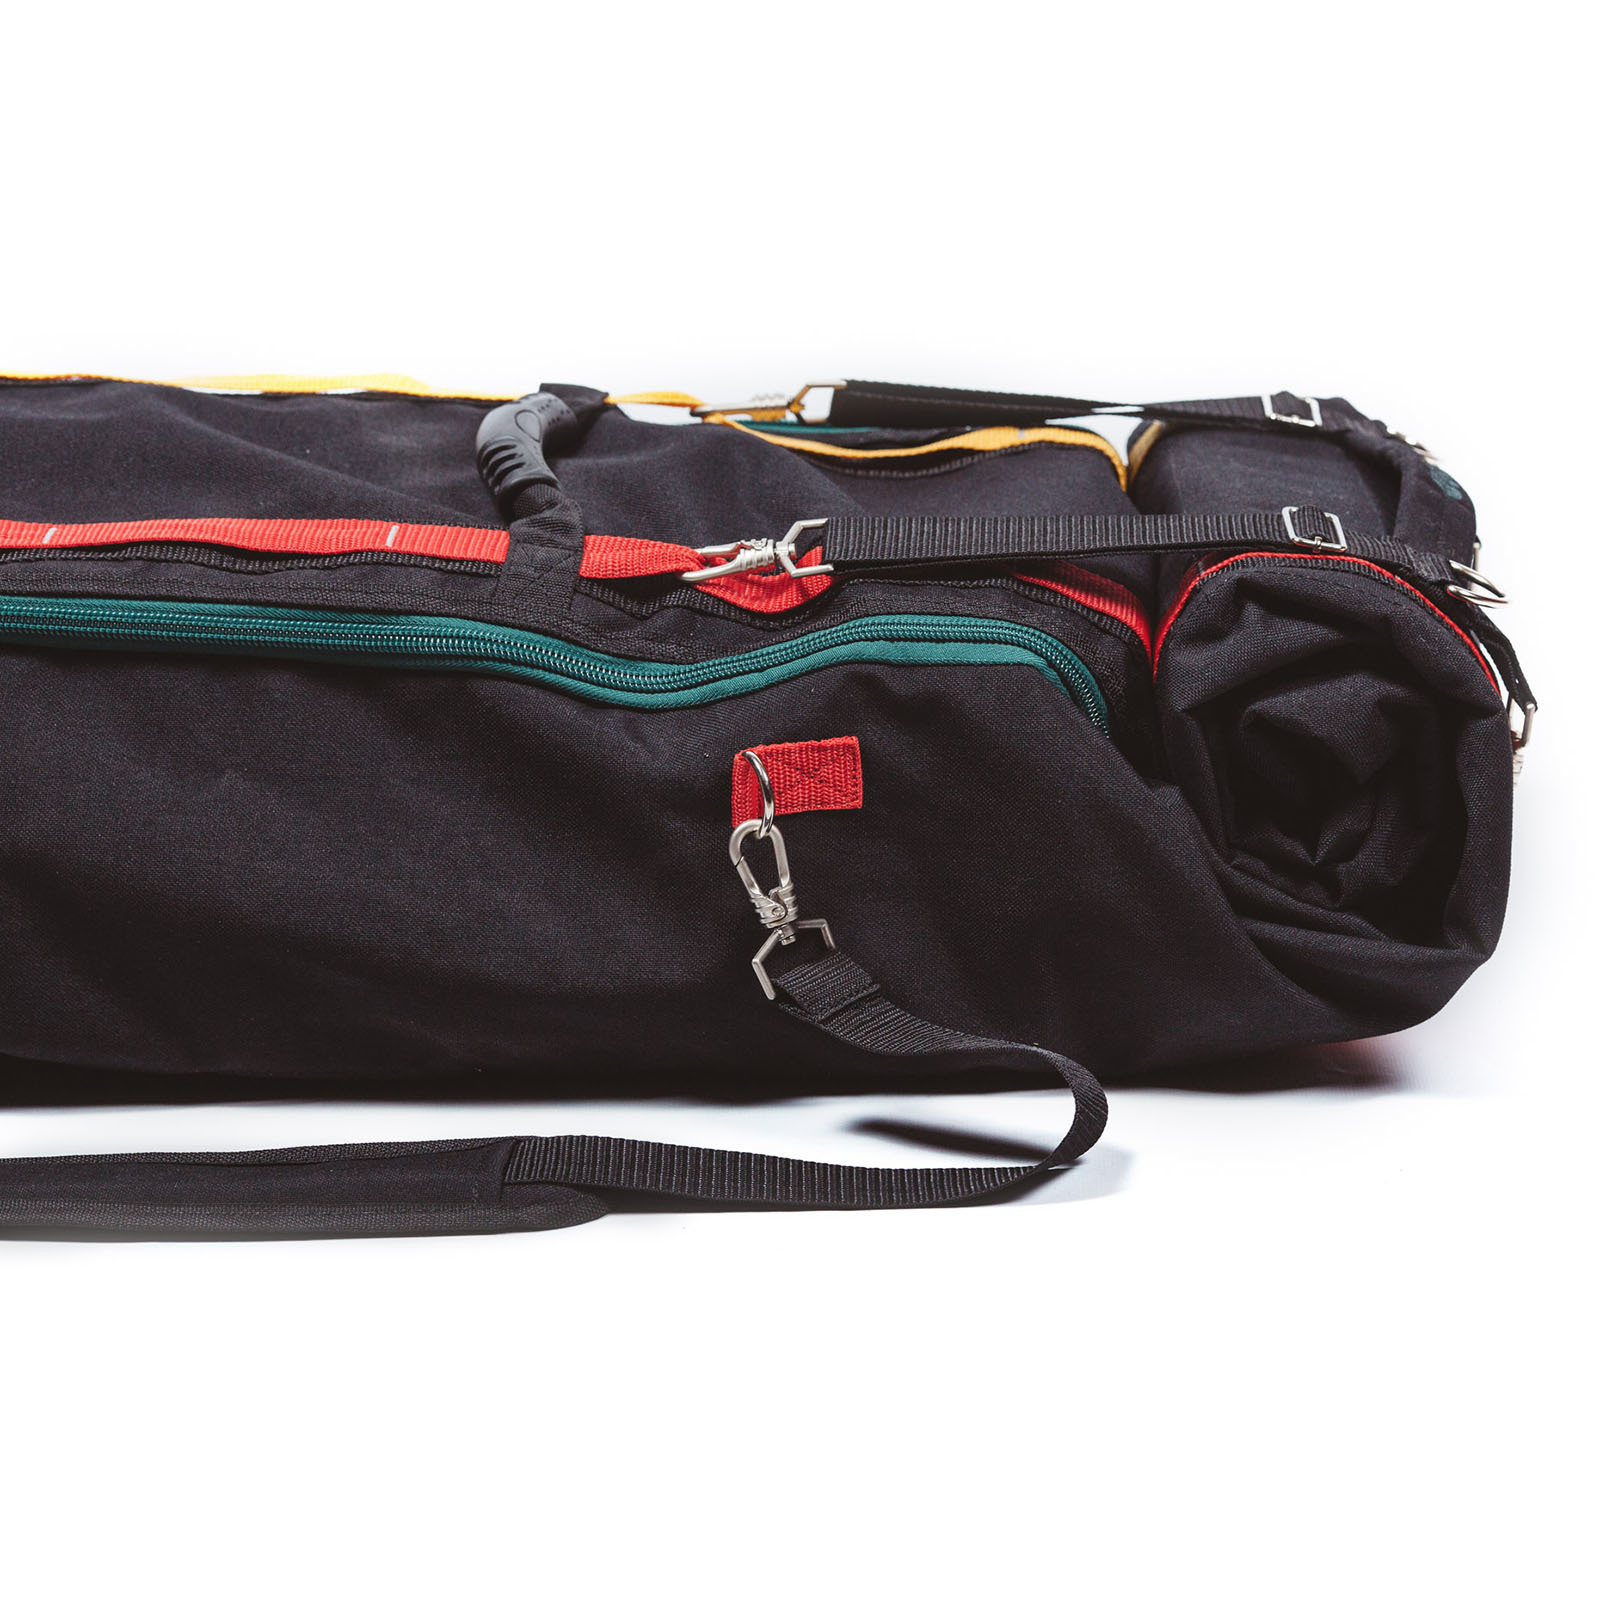 Чехол для лыж и сноуборда на колёсах Born Хаки 190 см (0099190)